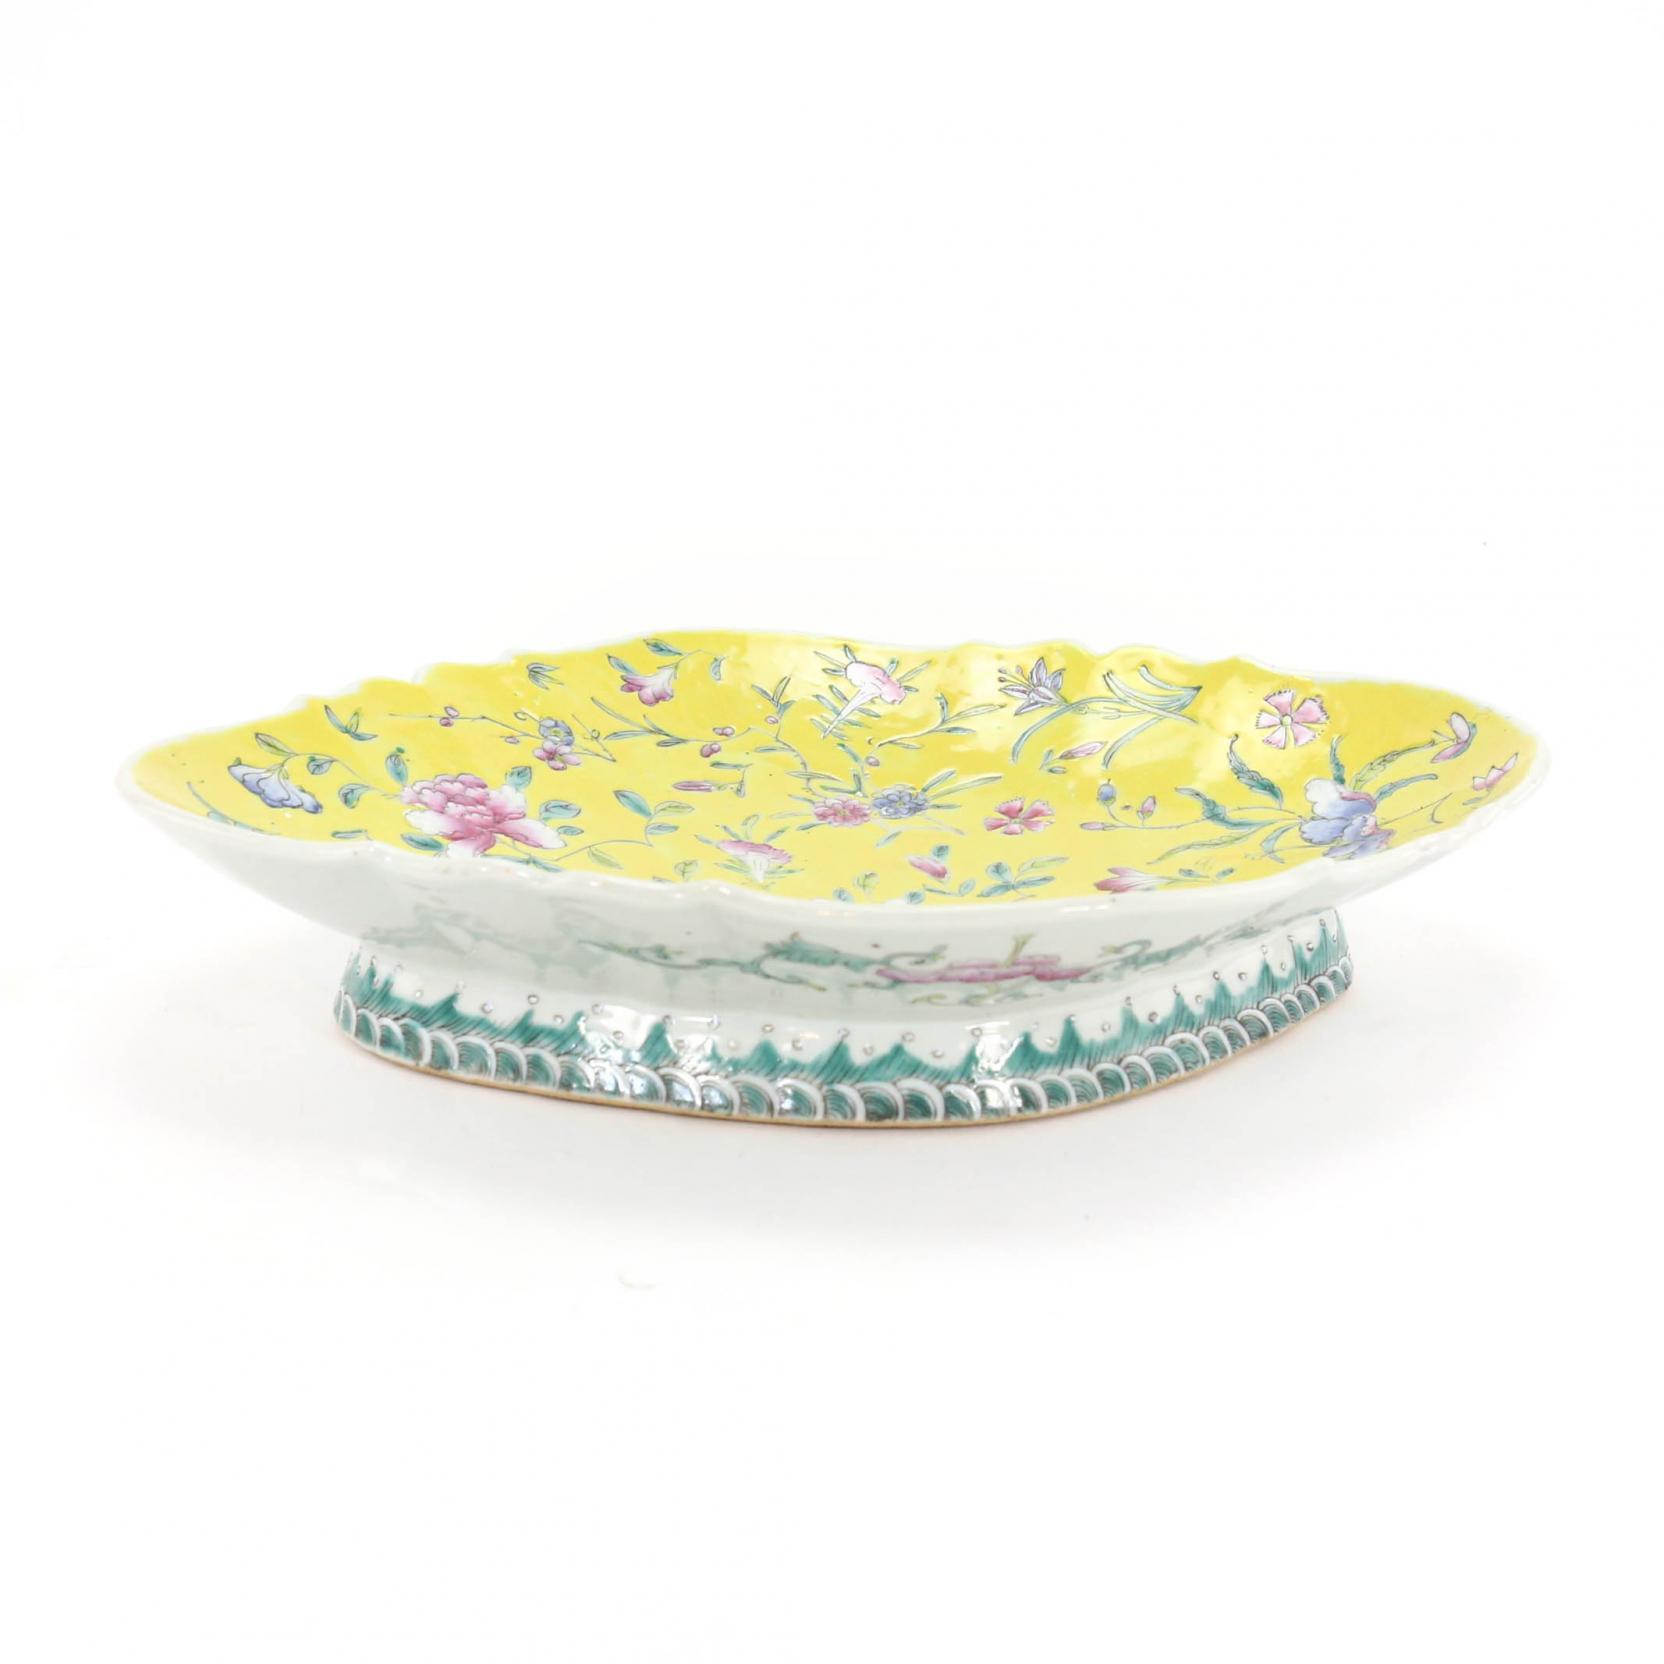 a-chinese-porcelain-enameled-platter